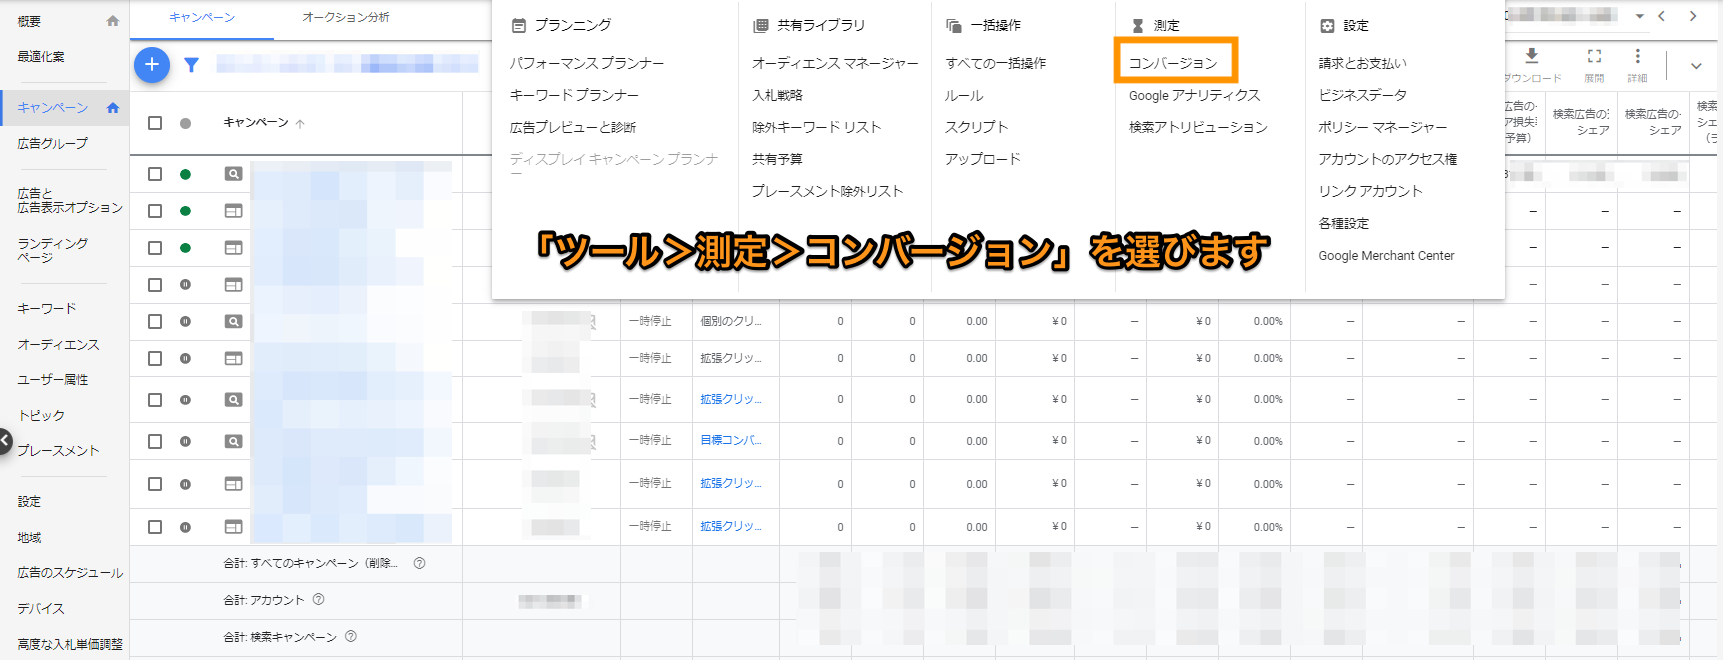 Google広告_1